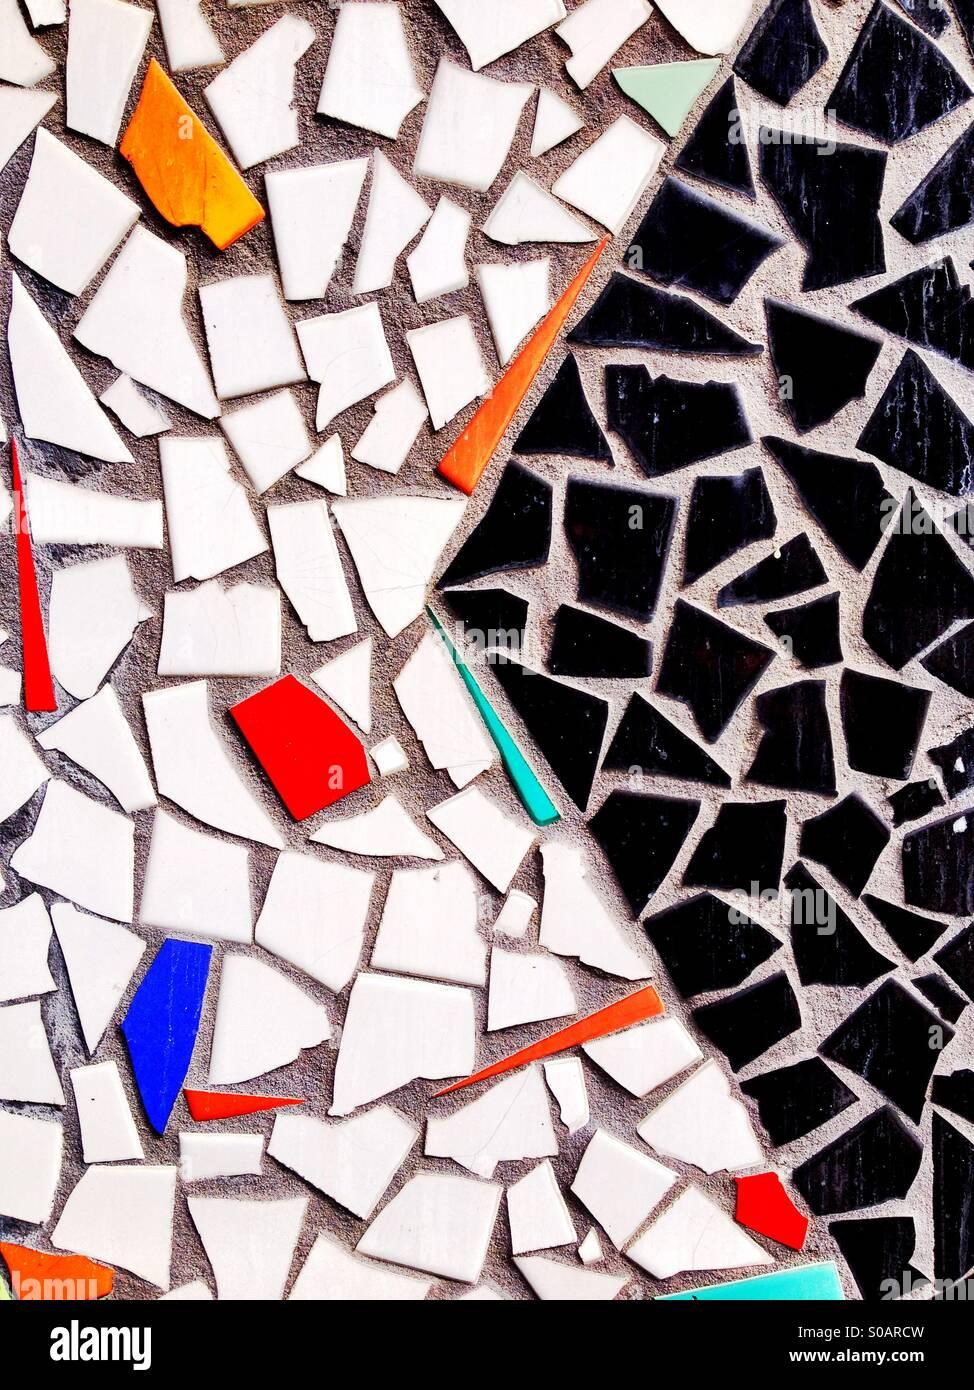 Mosaic Tile Design - Stock Image